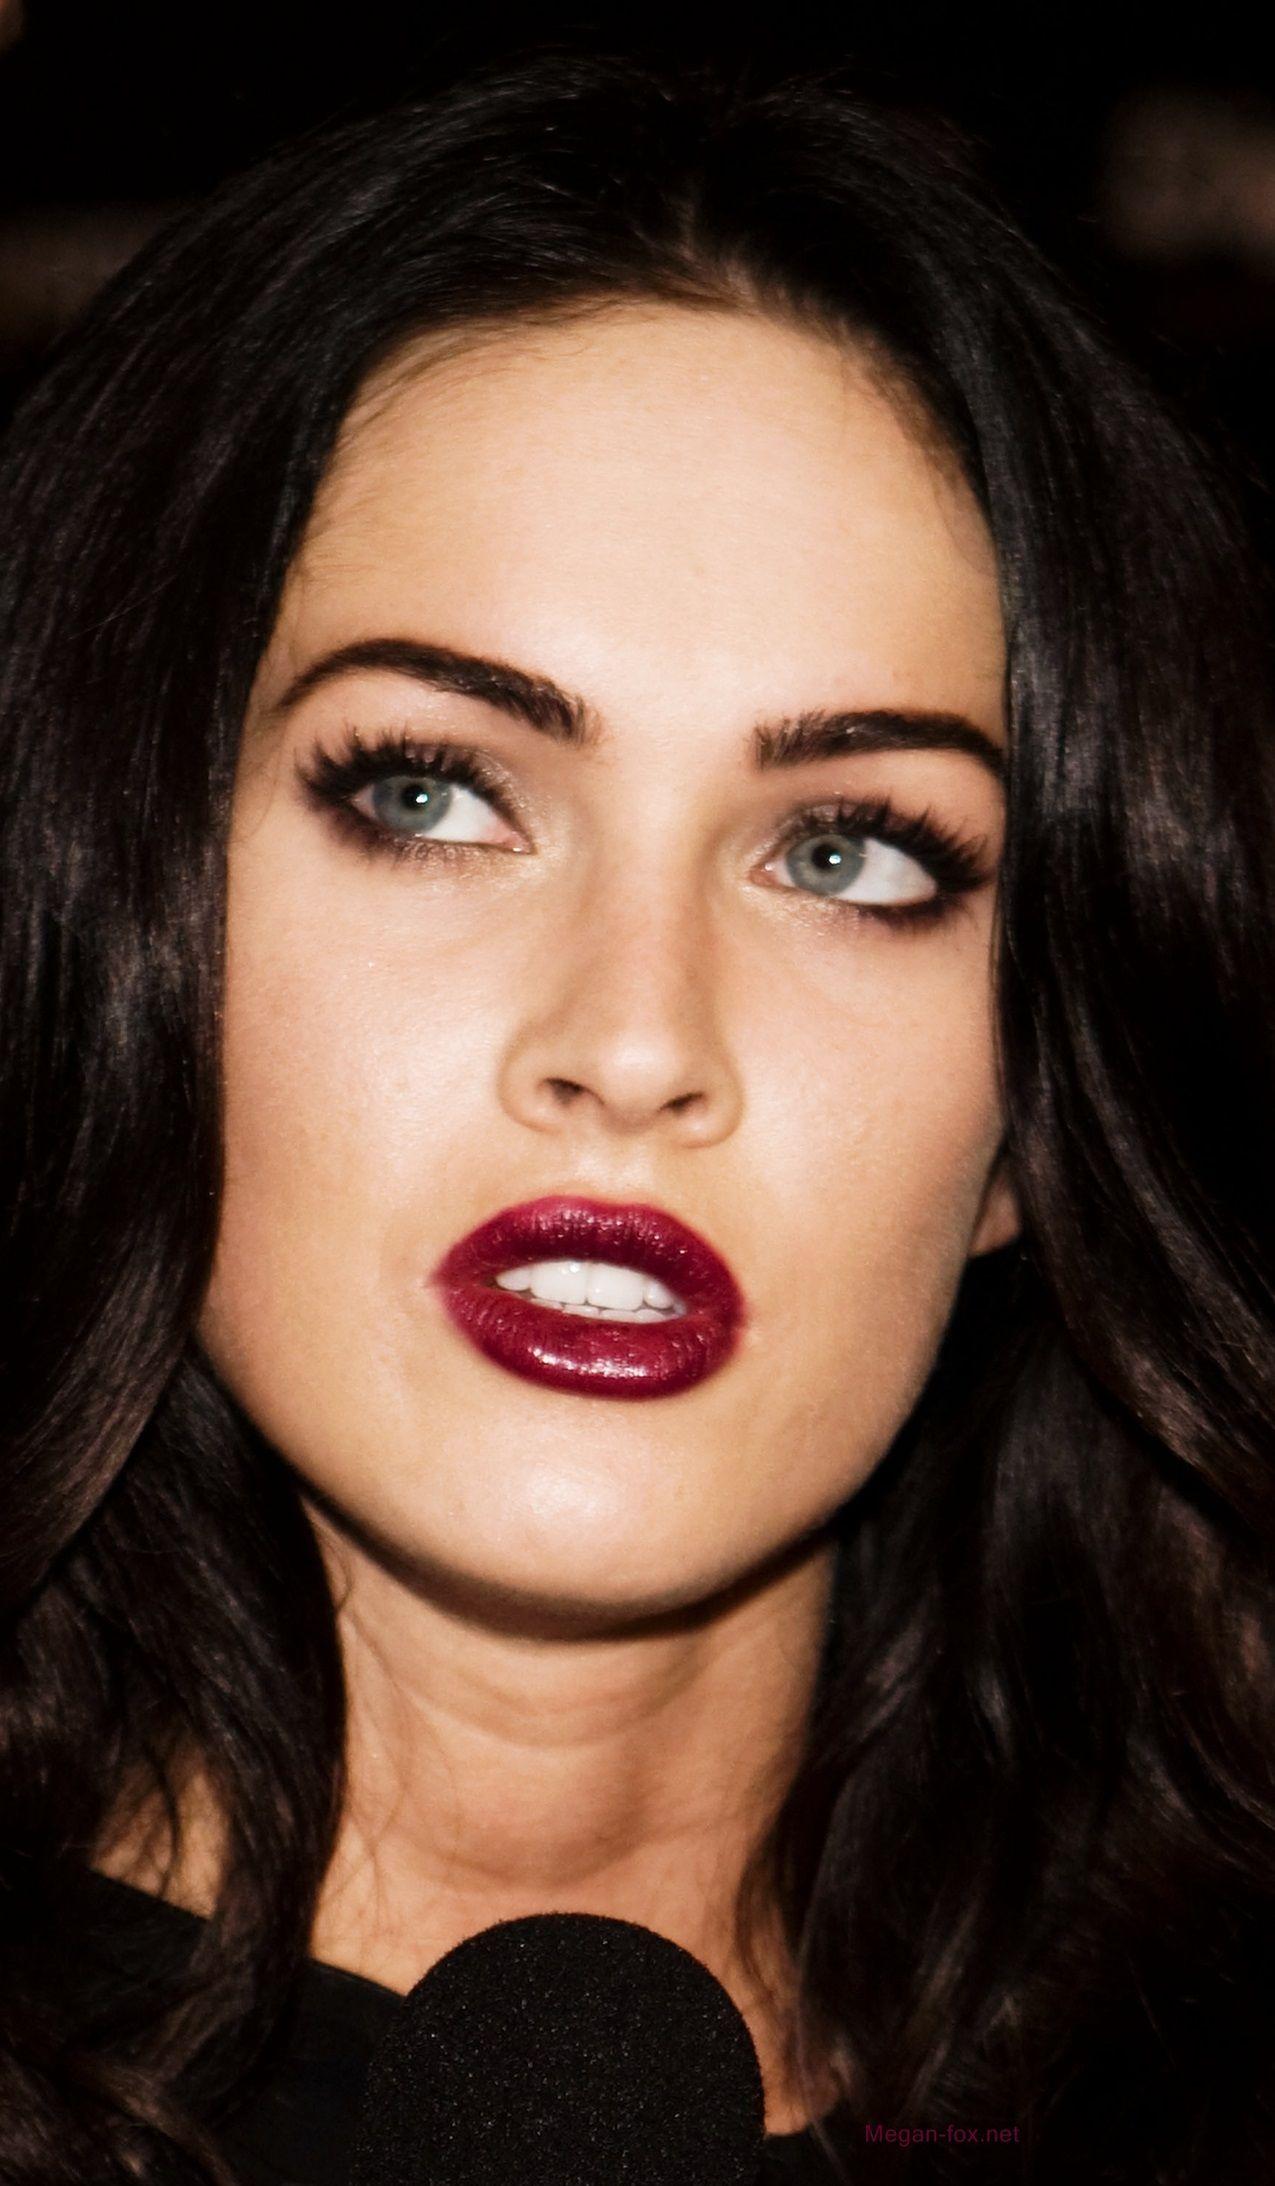 Dark hair and berry lips   Beauty   Pinterest   Megan fox ...